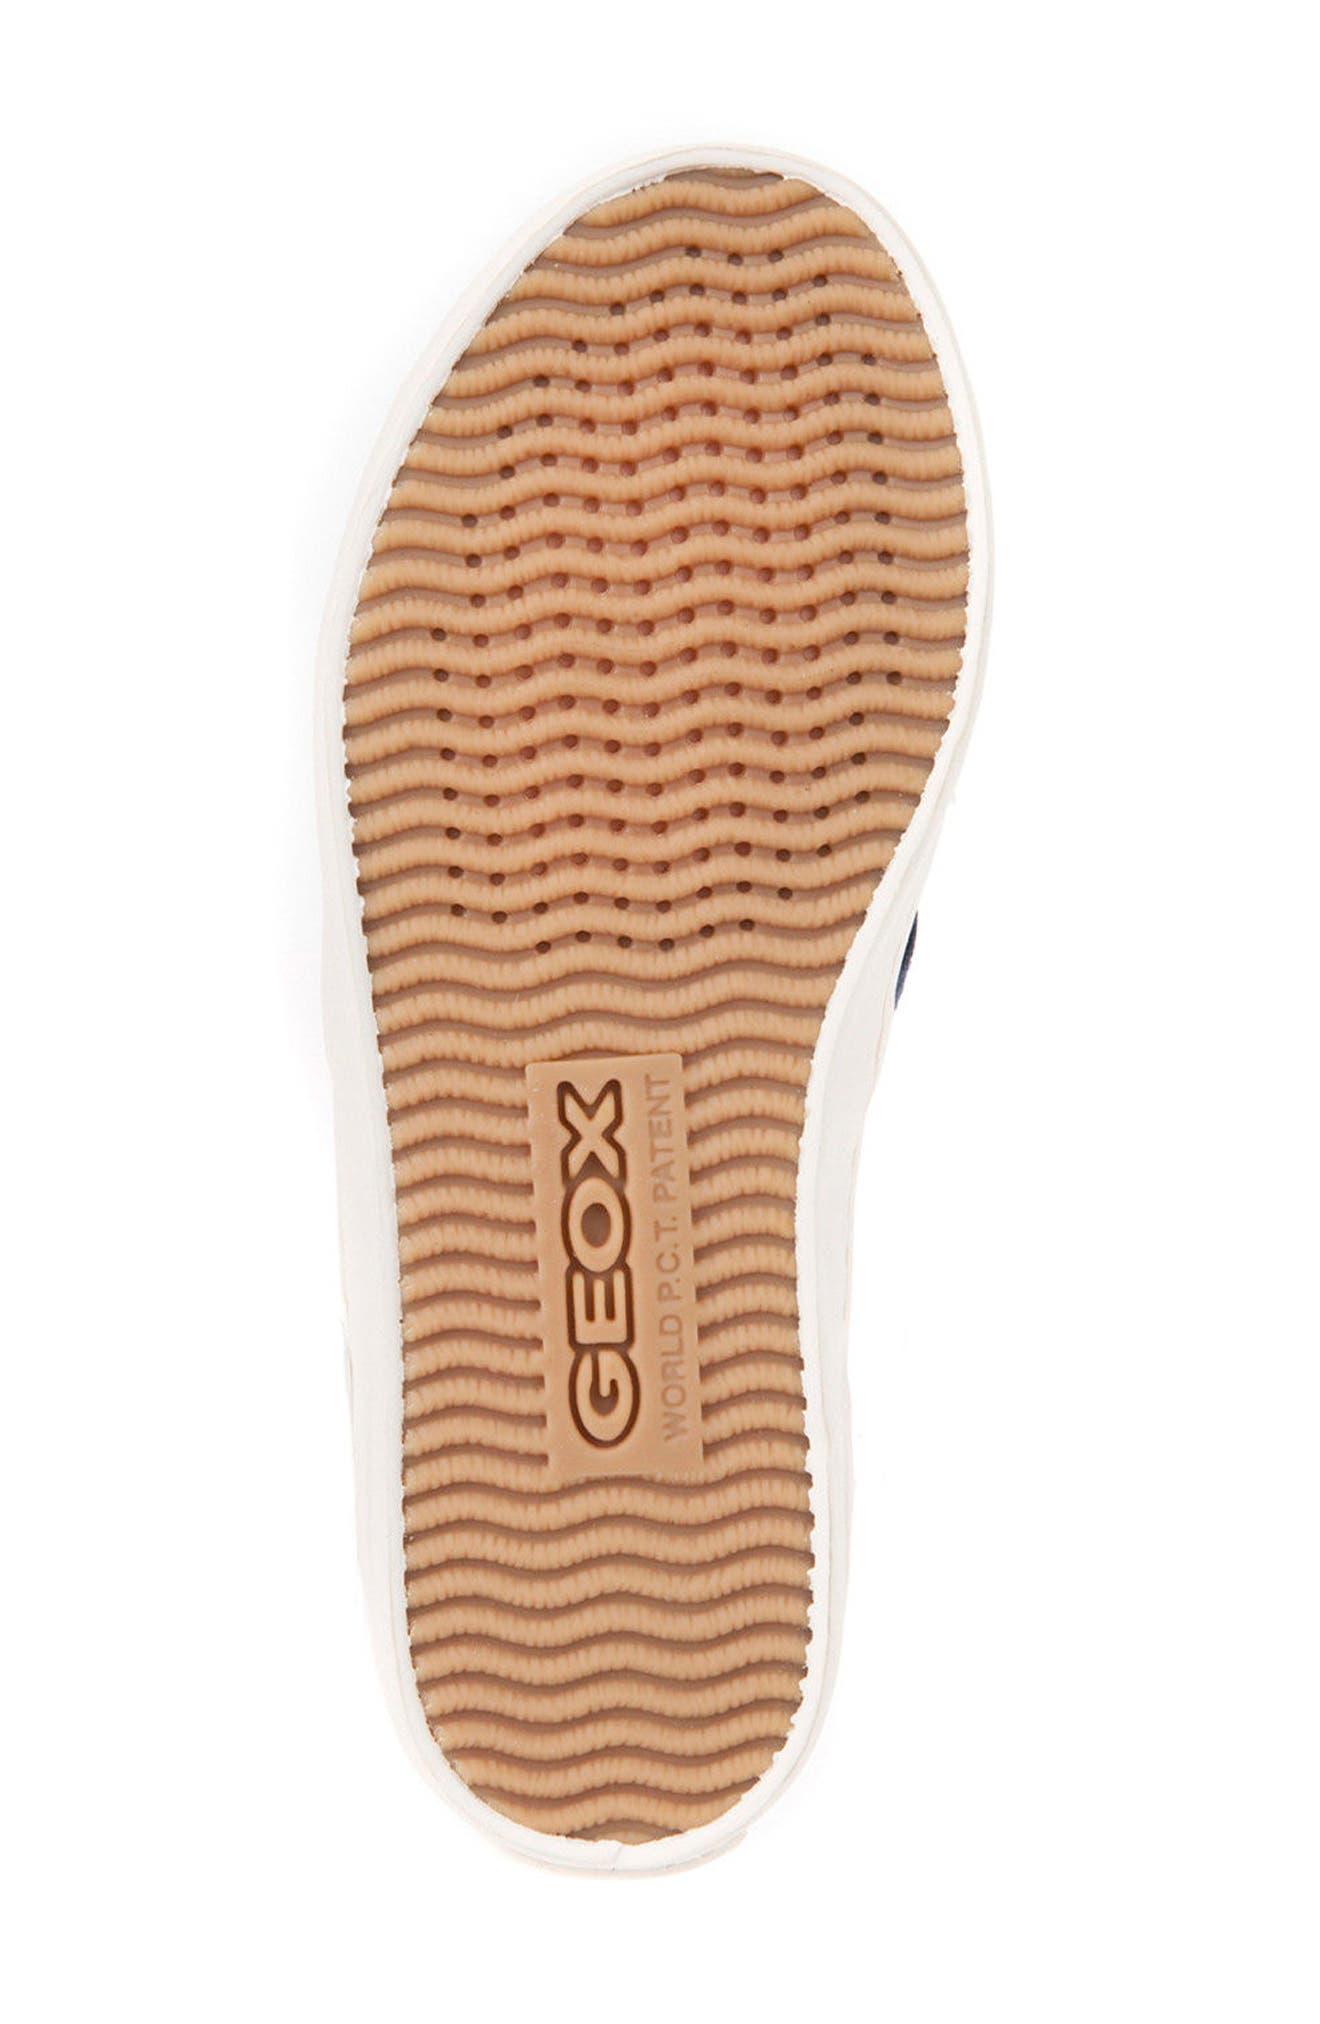 Jr Kiwi Slip-On Waterproof Sneaker,                             Alternate thumbnail 6, color,                             JEANS